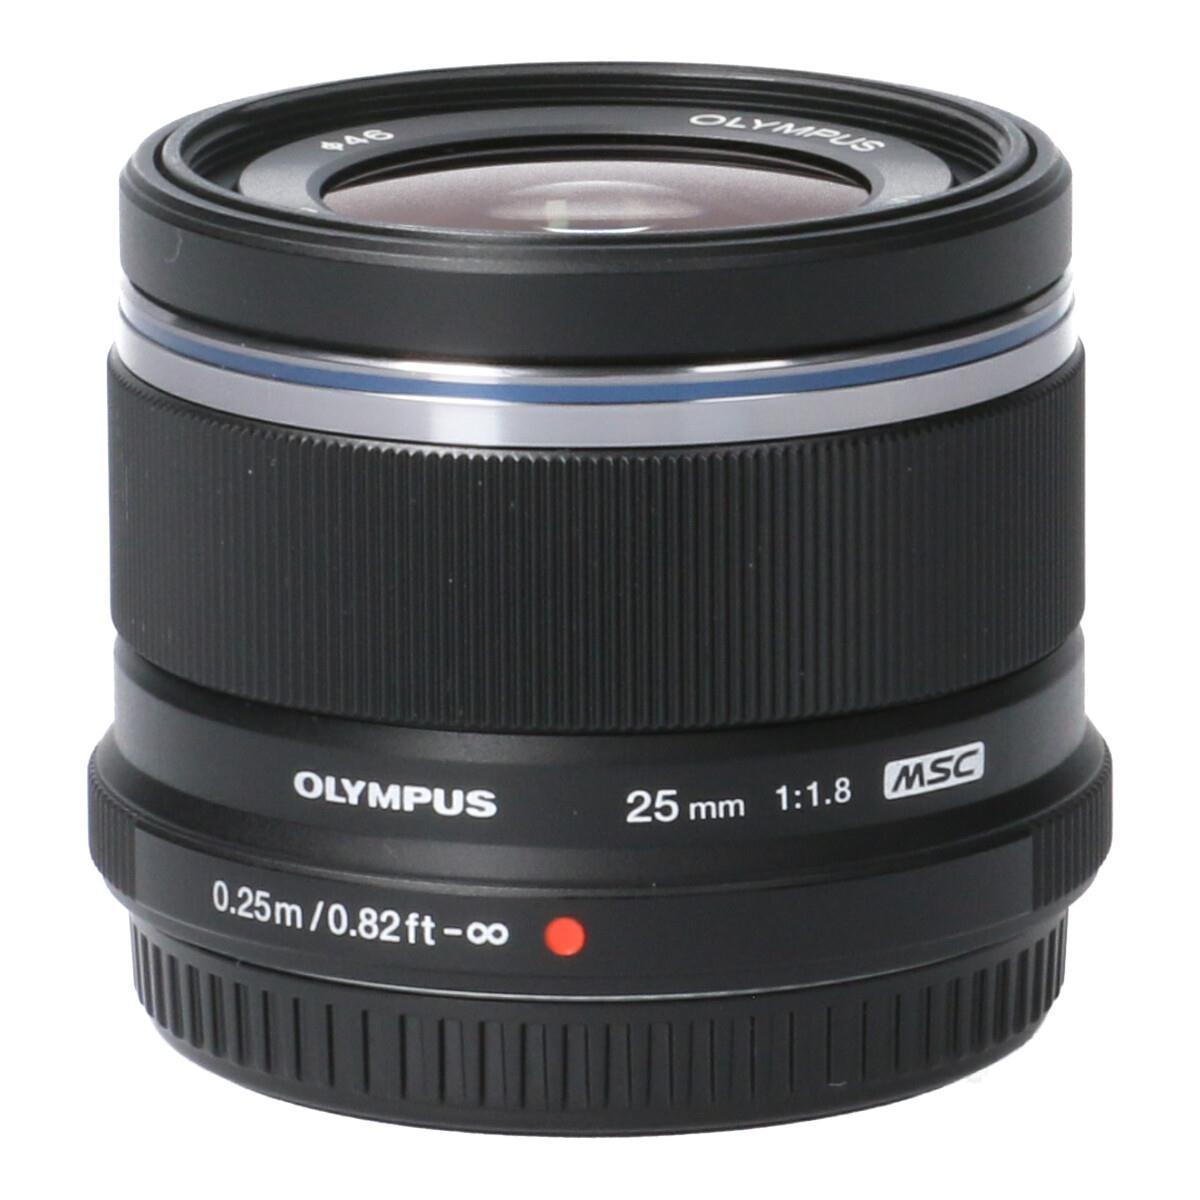 OLYMPUS MZD25mm F1.8BLACK【中古】